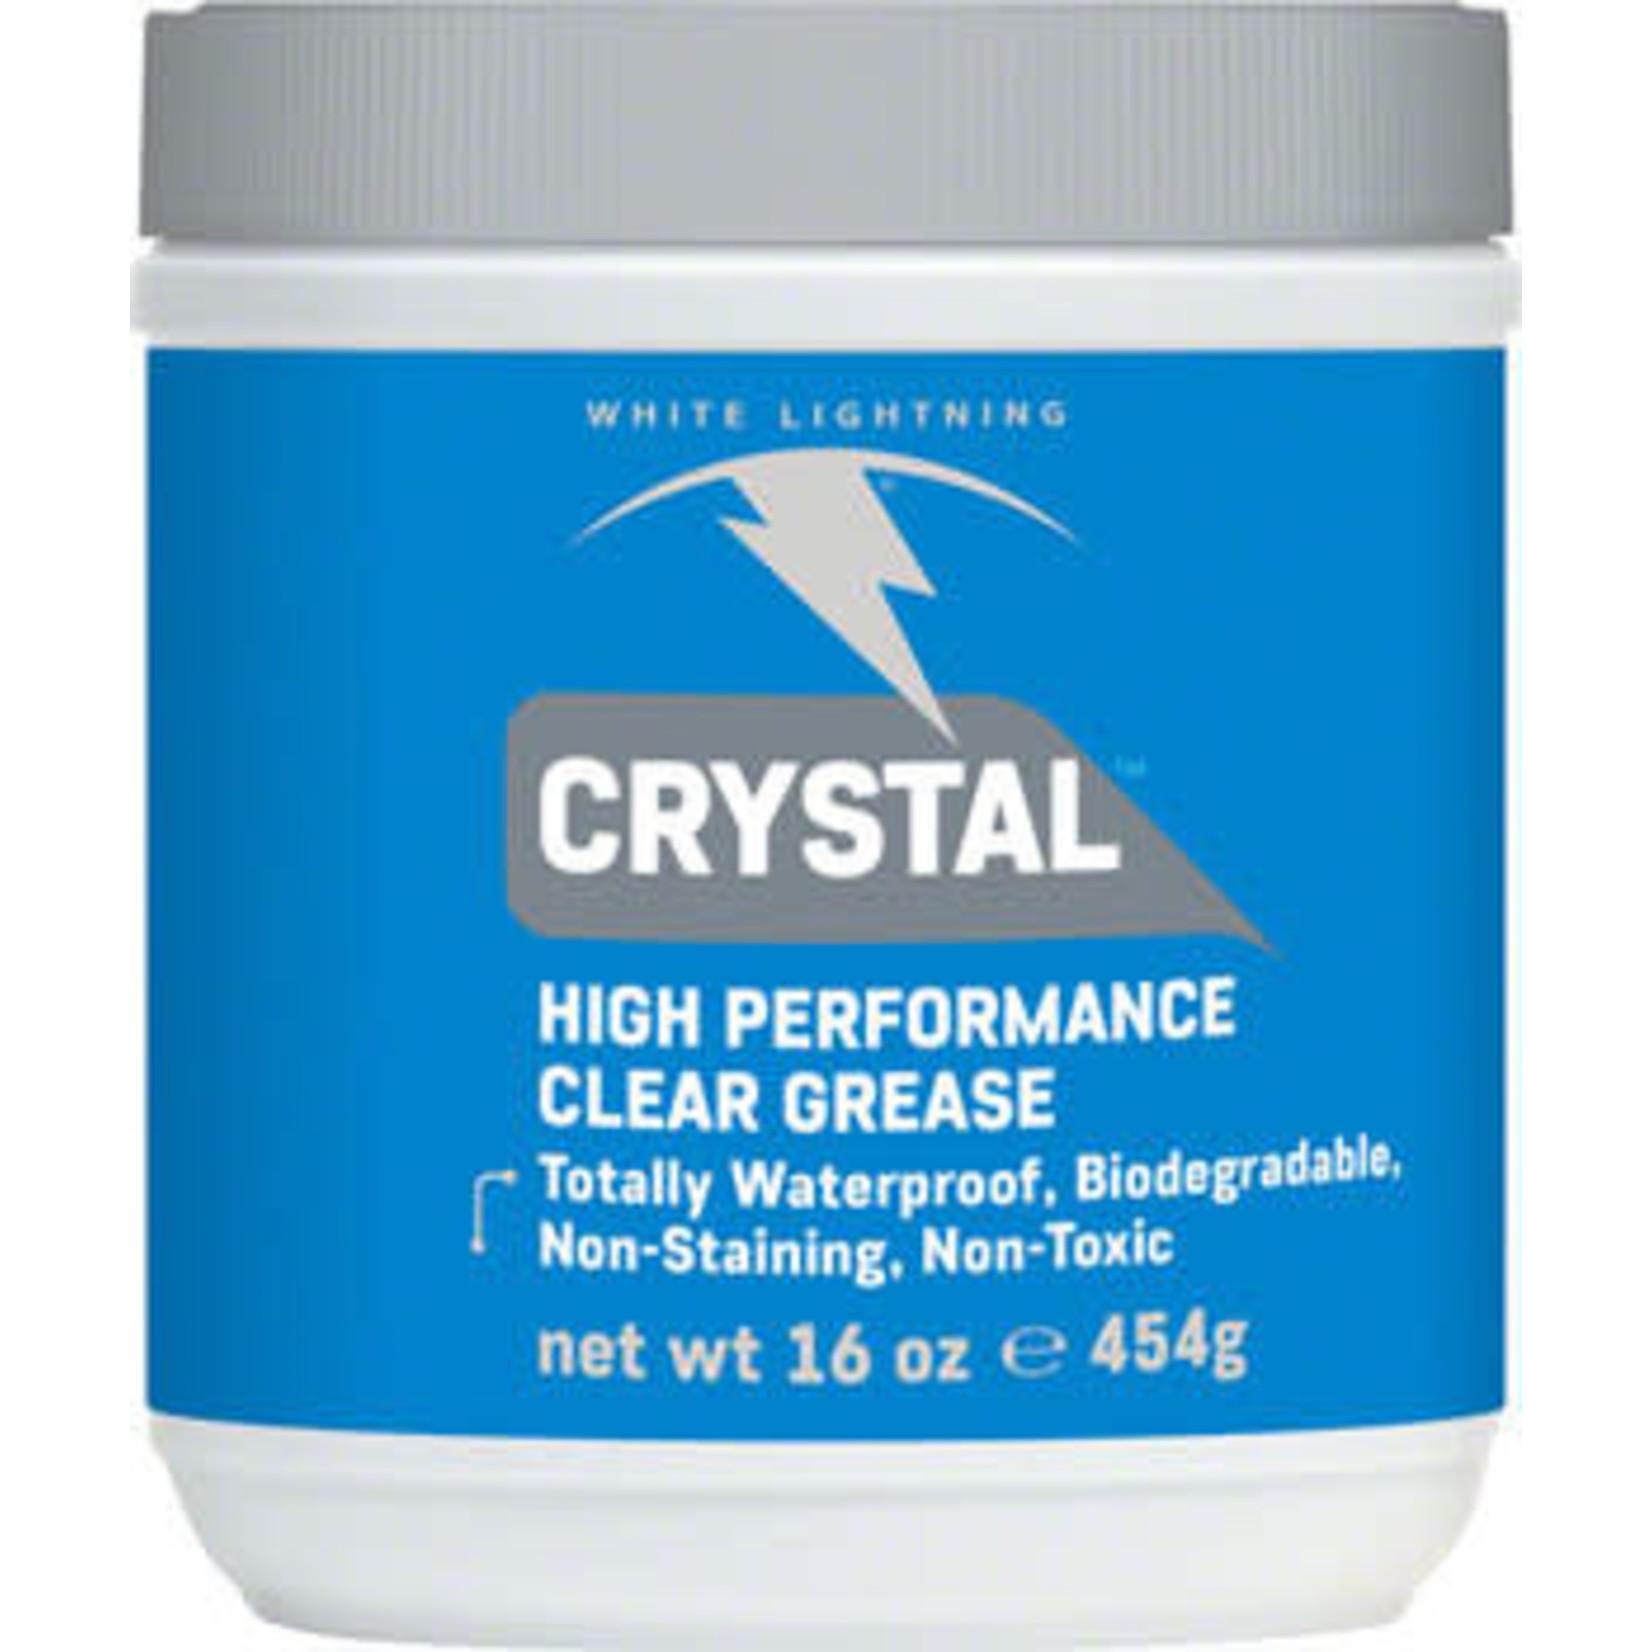 White Lightning White Lightning Crystal Grease 16oz Tub